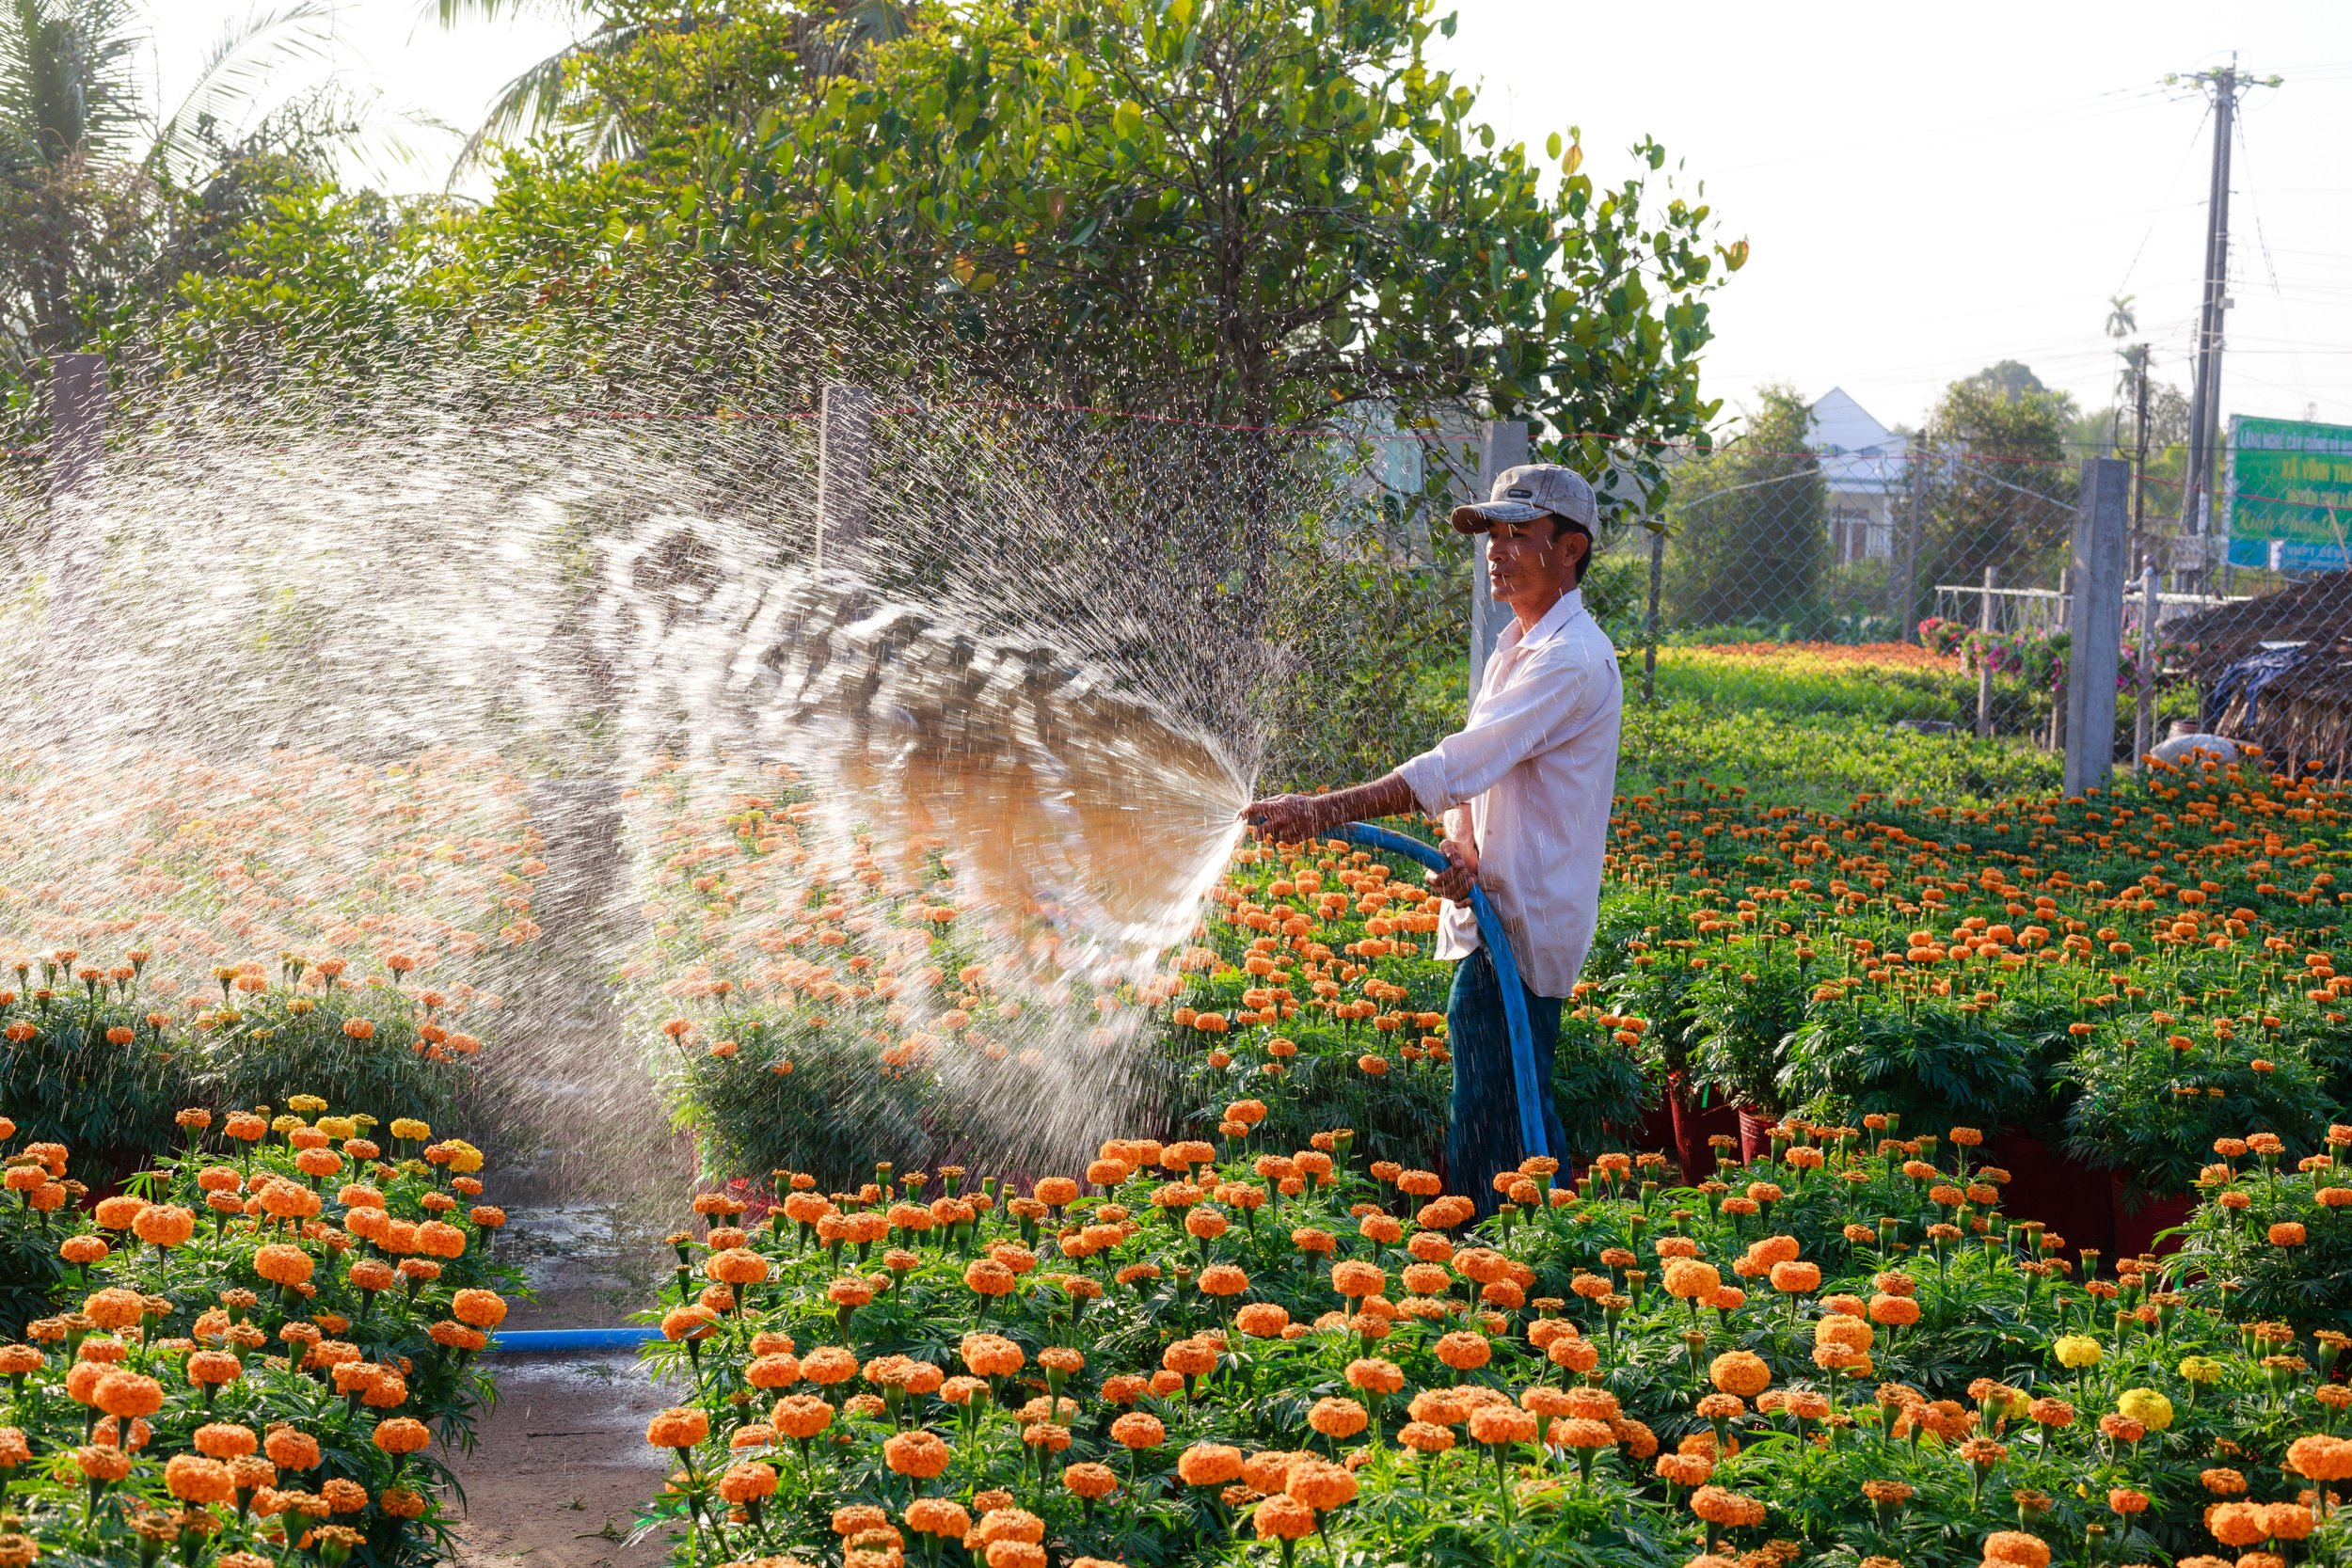 agriculture-beautiful-flowers-farm-2134798.jpg